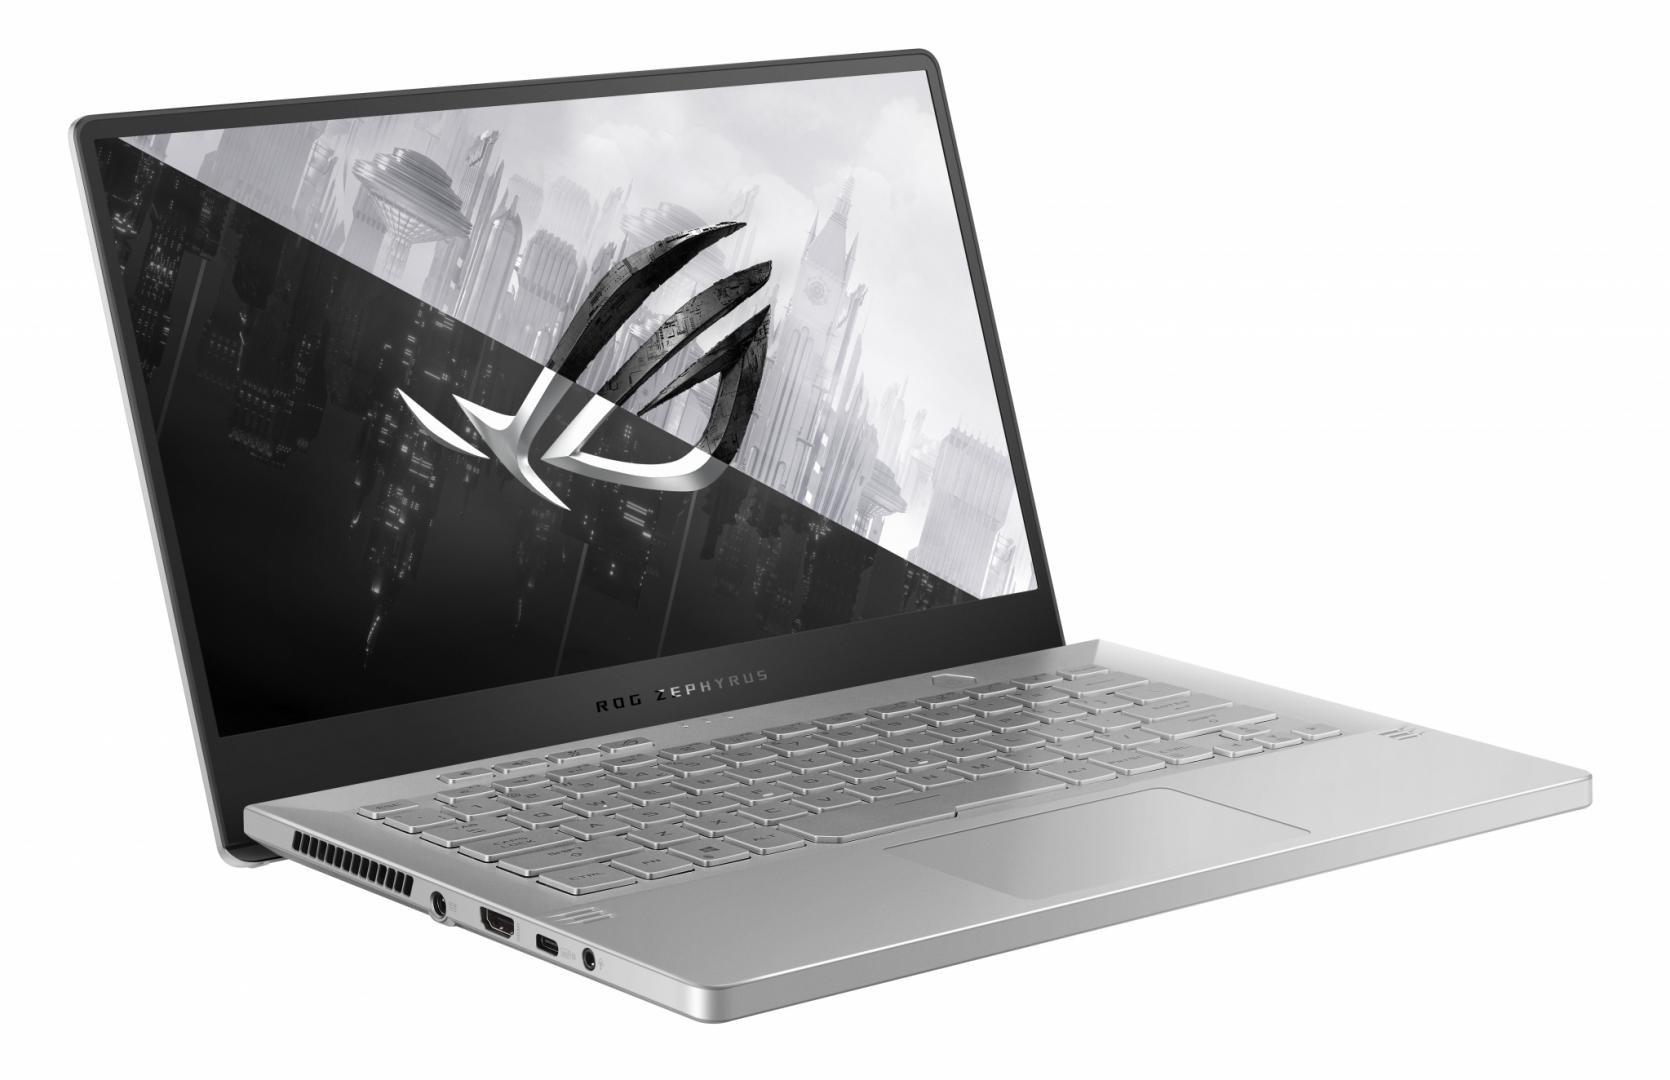 Laptop Gaming ASUS ROG Zephyrus G14 GA401QE-HZ052T, 14-inch, FHD (1920 x 1080) 16:9, Anti-glare display, IPS-level, AMD Ryzen™ 7 5800HS Processor 3.0GHz(16MCache,upto4.3GHz), NVIDIA®GeForceRTX™3050Ti Laptop GPU, 8GB DDR4 on board + 8GB DDR4-3200 SO-DIMM, 512GB M.2 NVMe™ PCIe® 3.0 SSD - imaginea 3